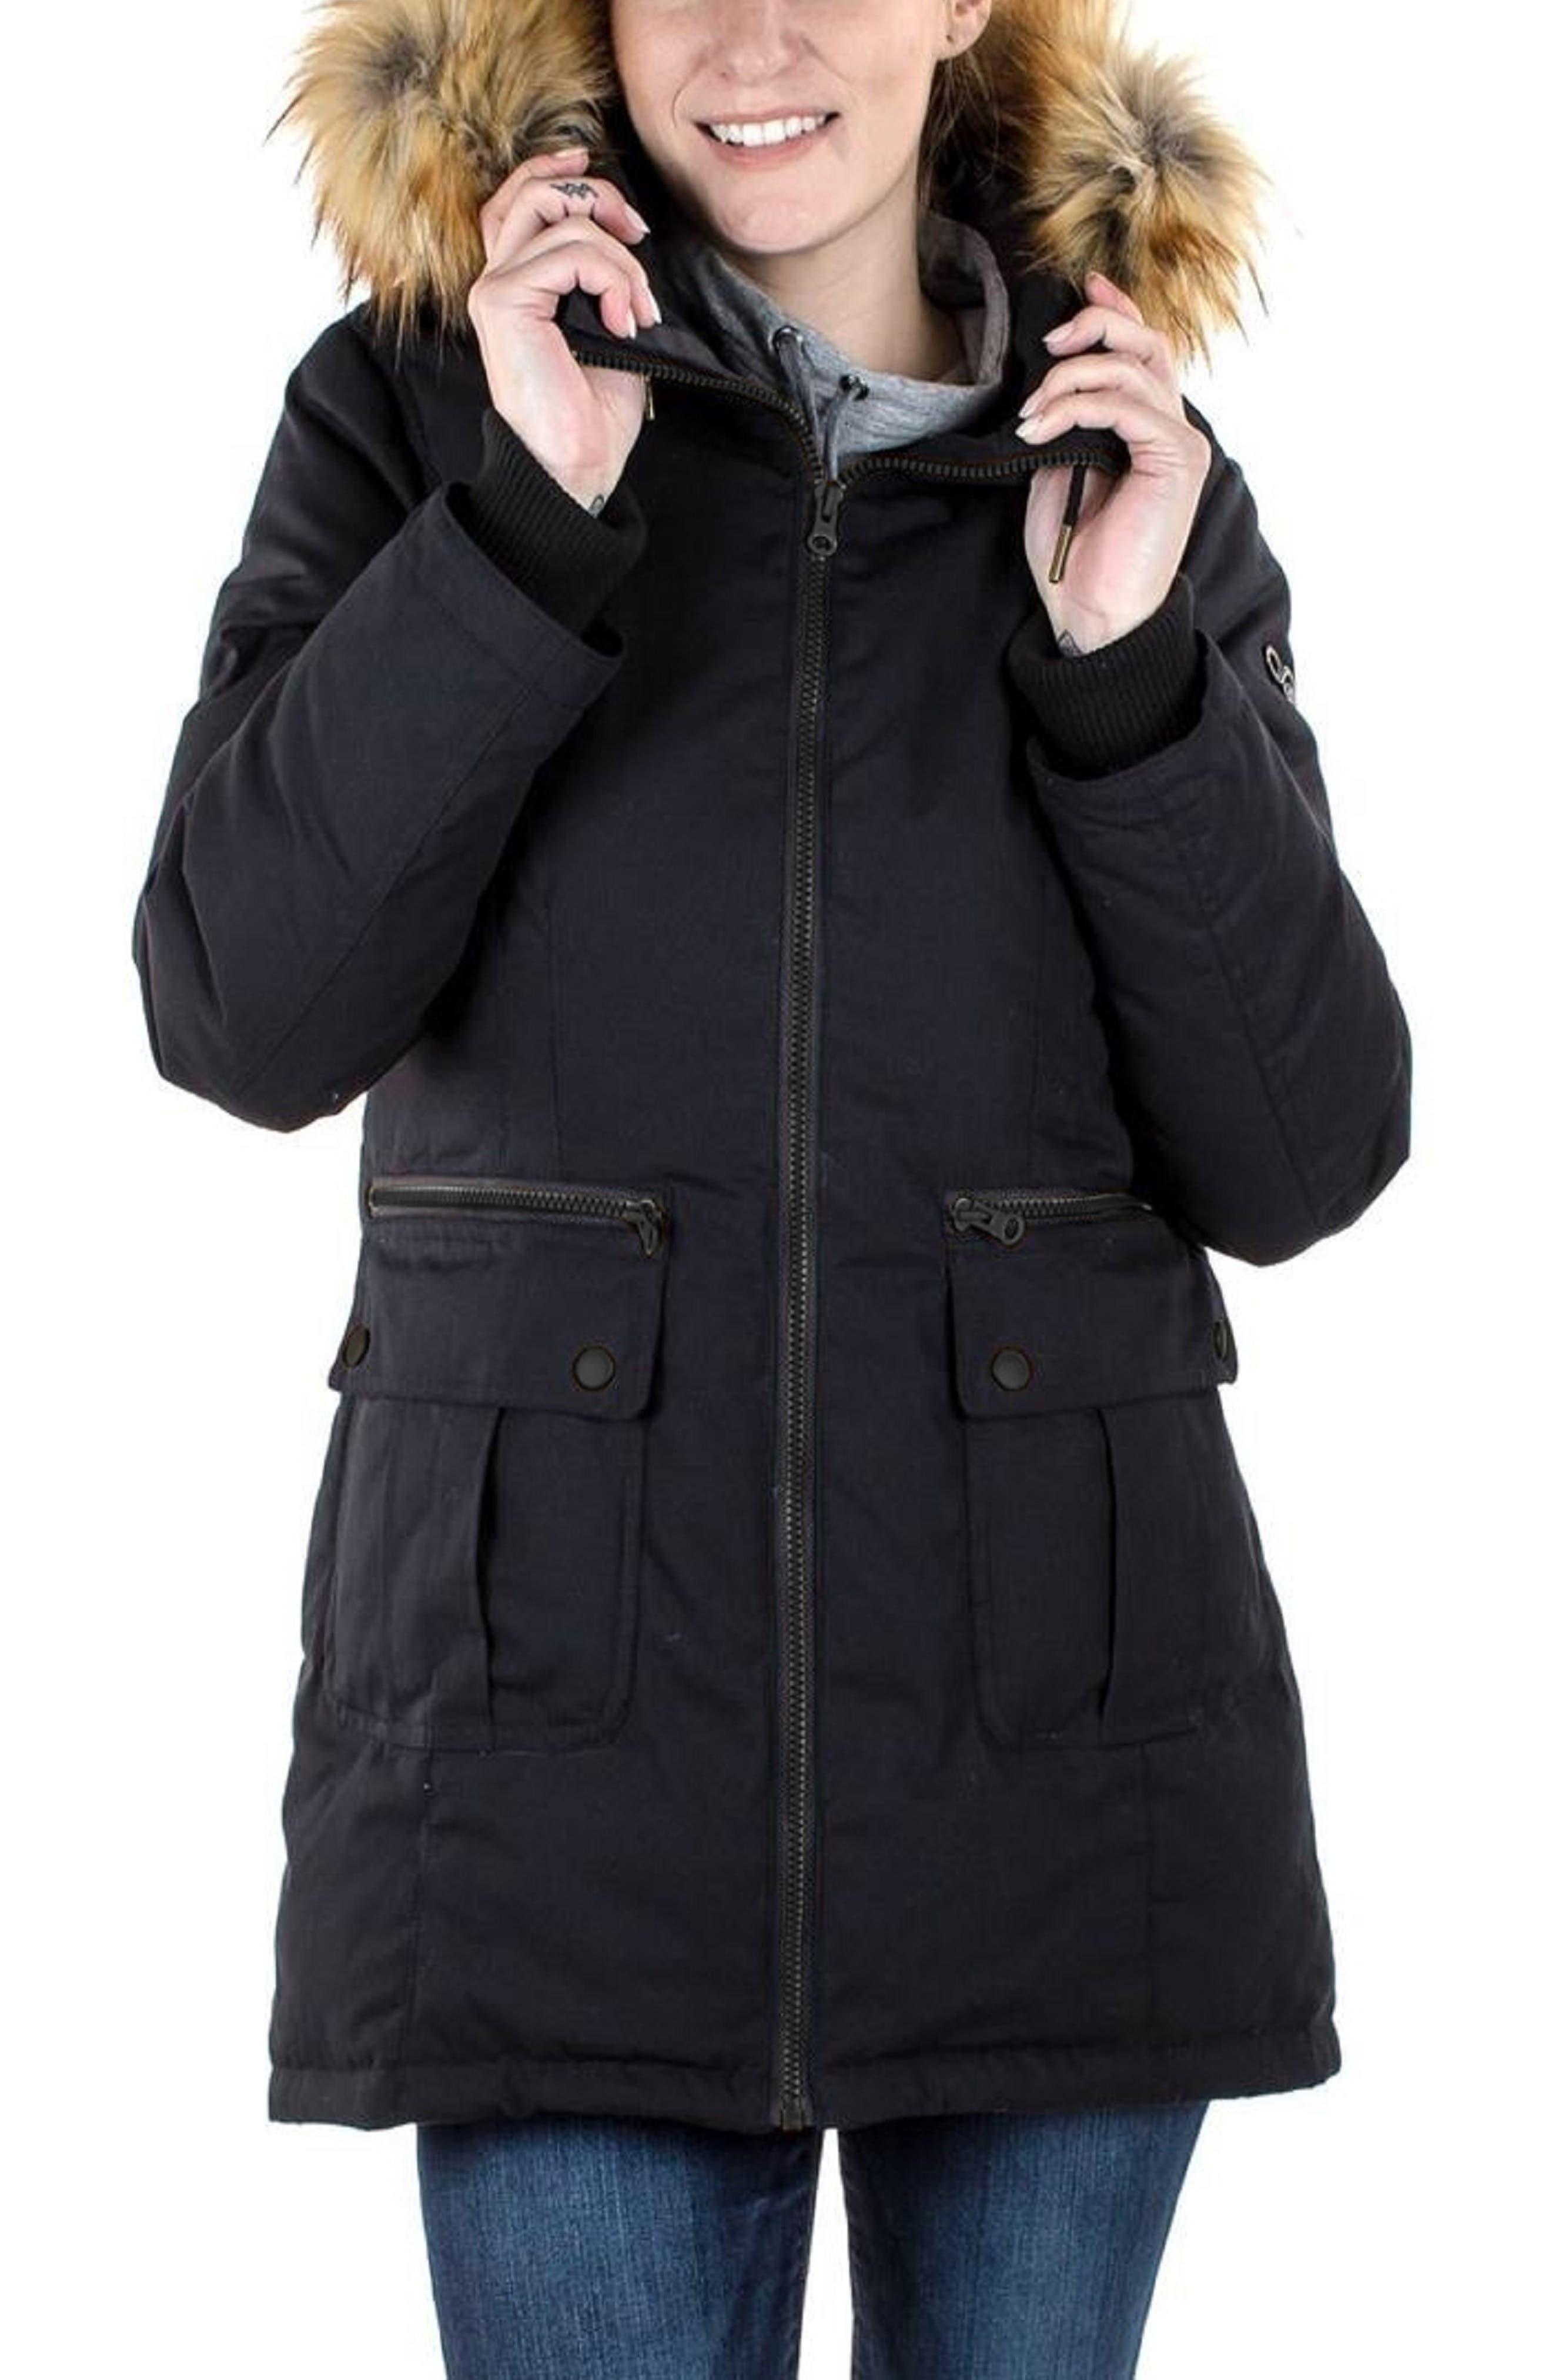 MODERN ETERNITY, Convertible Down 3-in-1 Maternity Jacket, Alternate thumbnail 4, color, BLACK